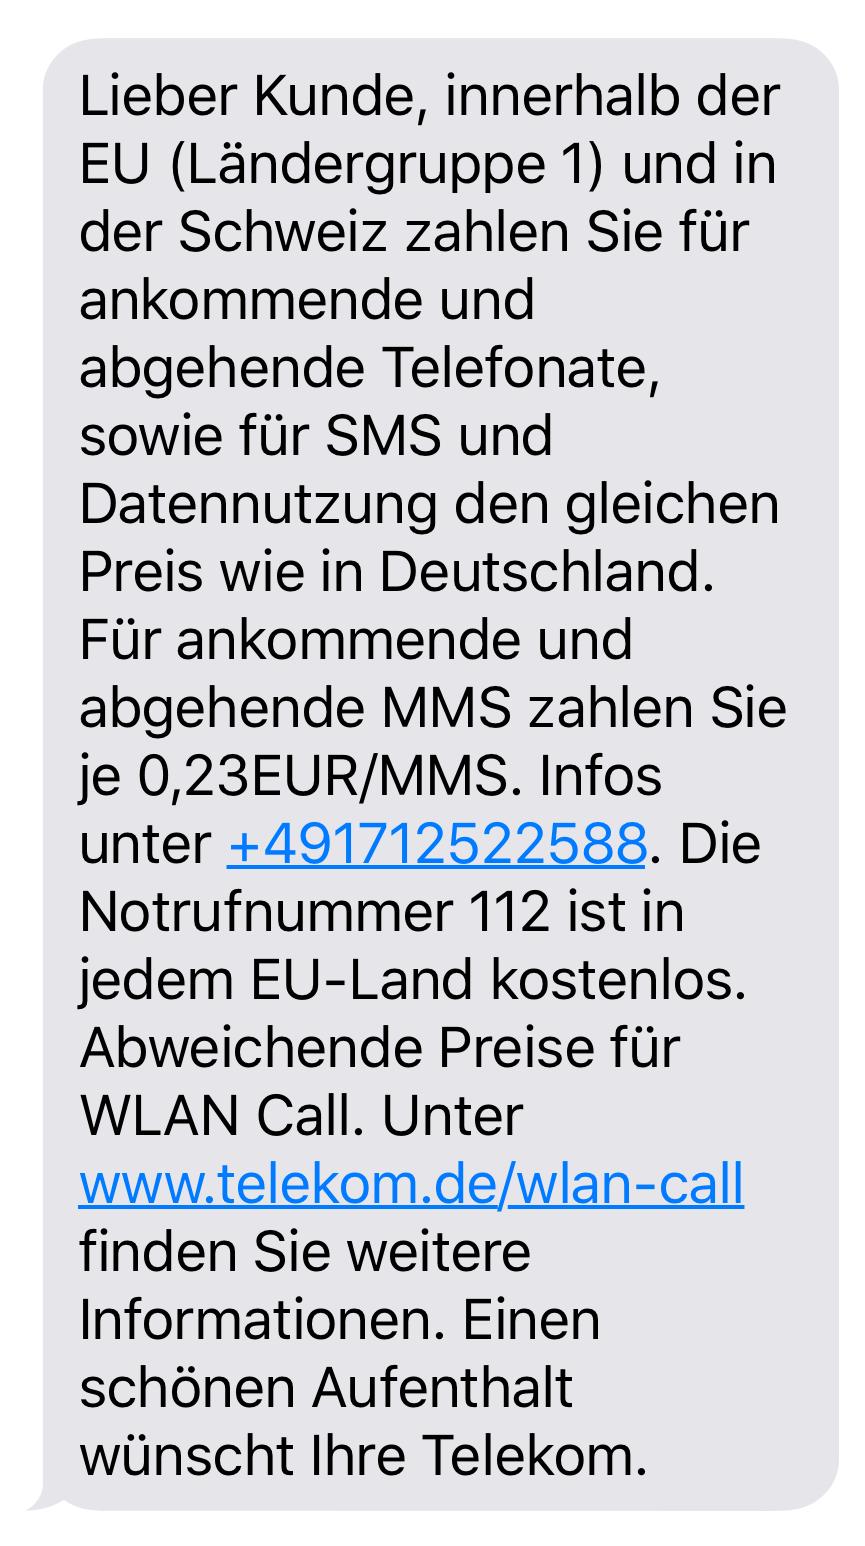 Telekom-Roaming-Info per SMS